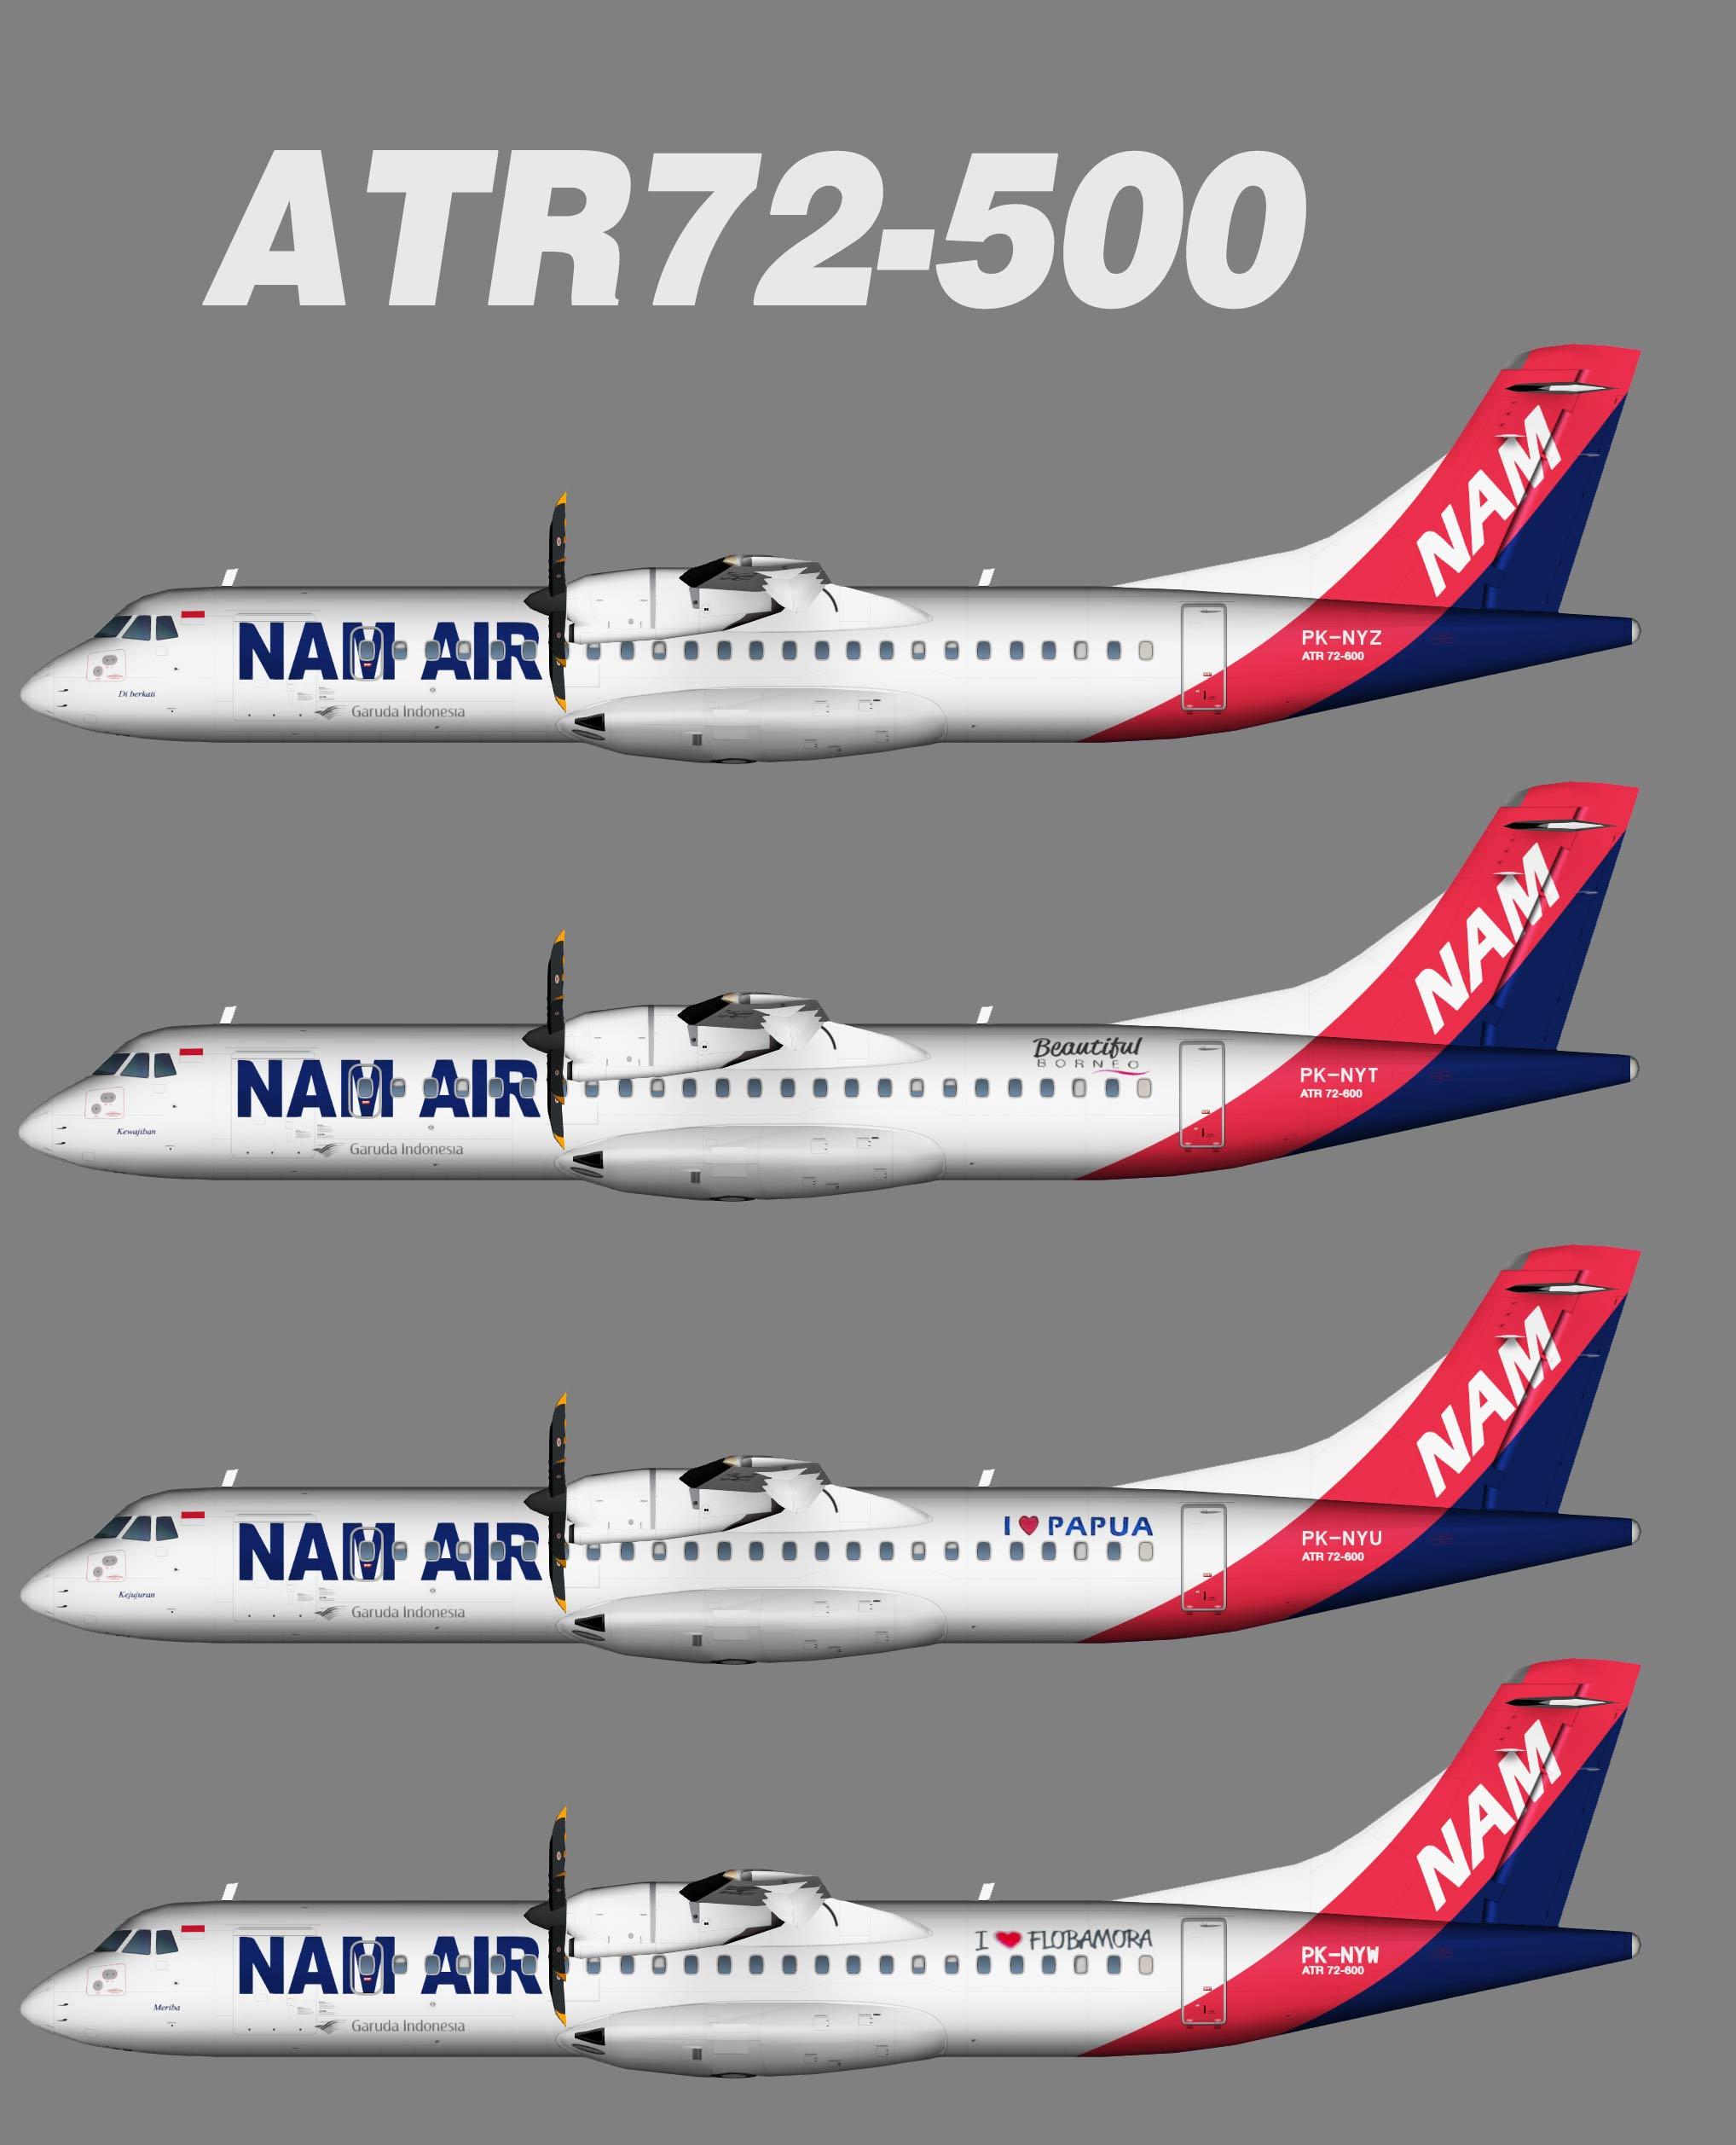 NAM Air ATR 72-600